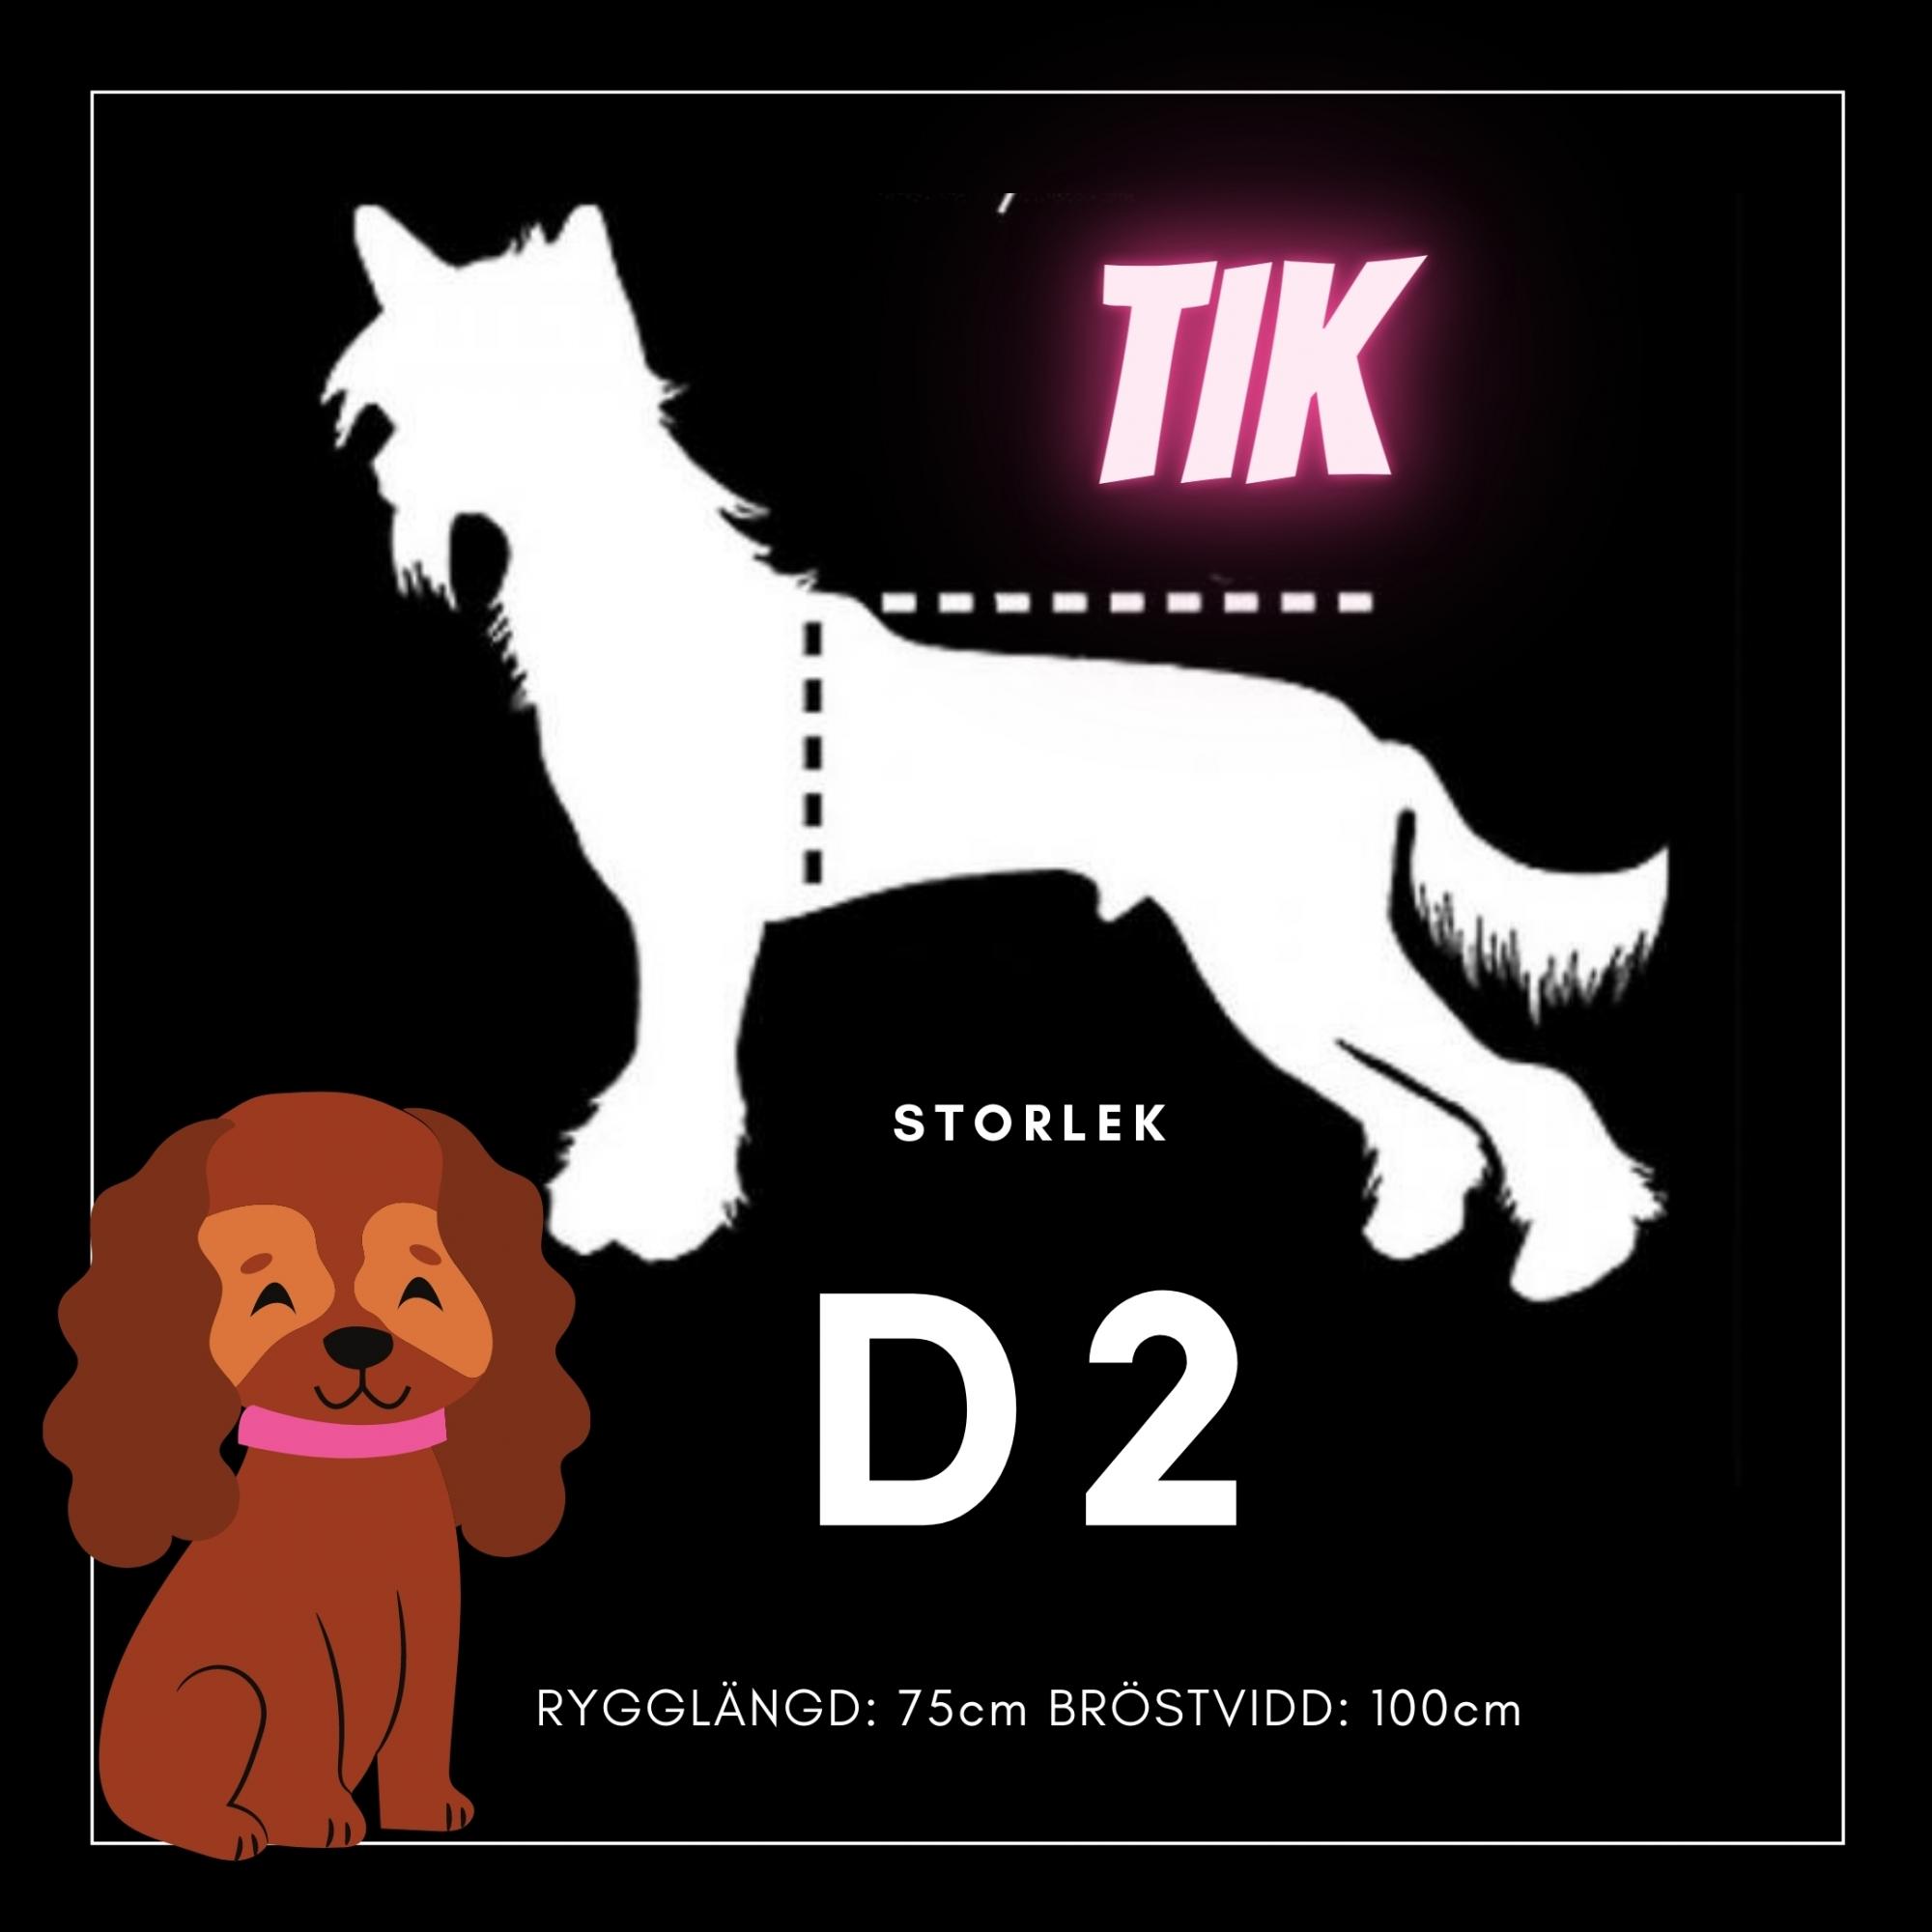 Tik Storlek D2 - Passion For Pet Fashion